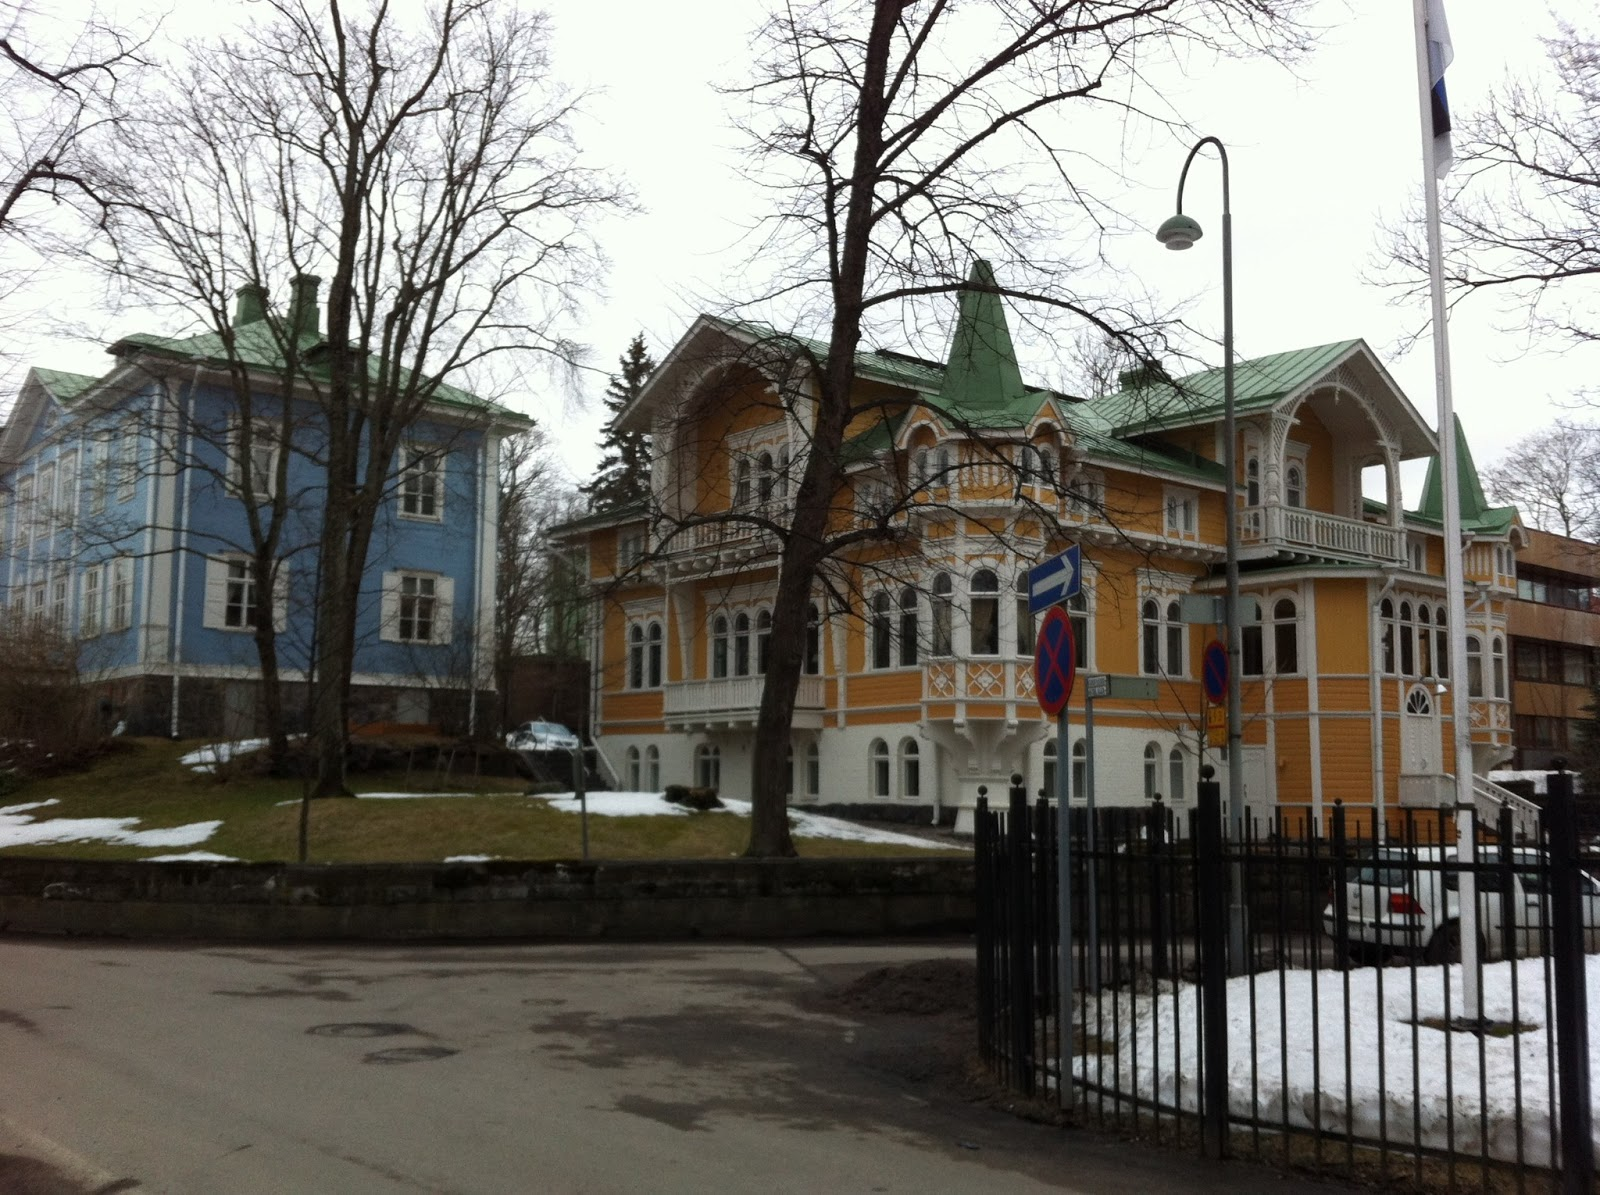 Keväinen Helsinki – The vernal Helsinki